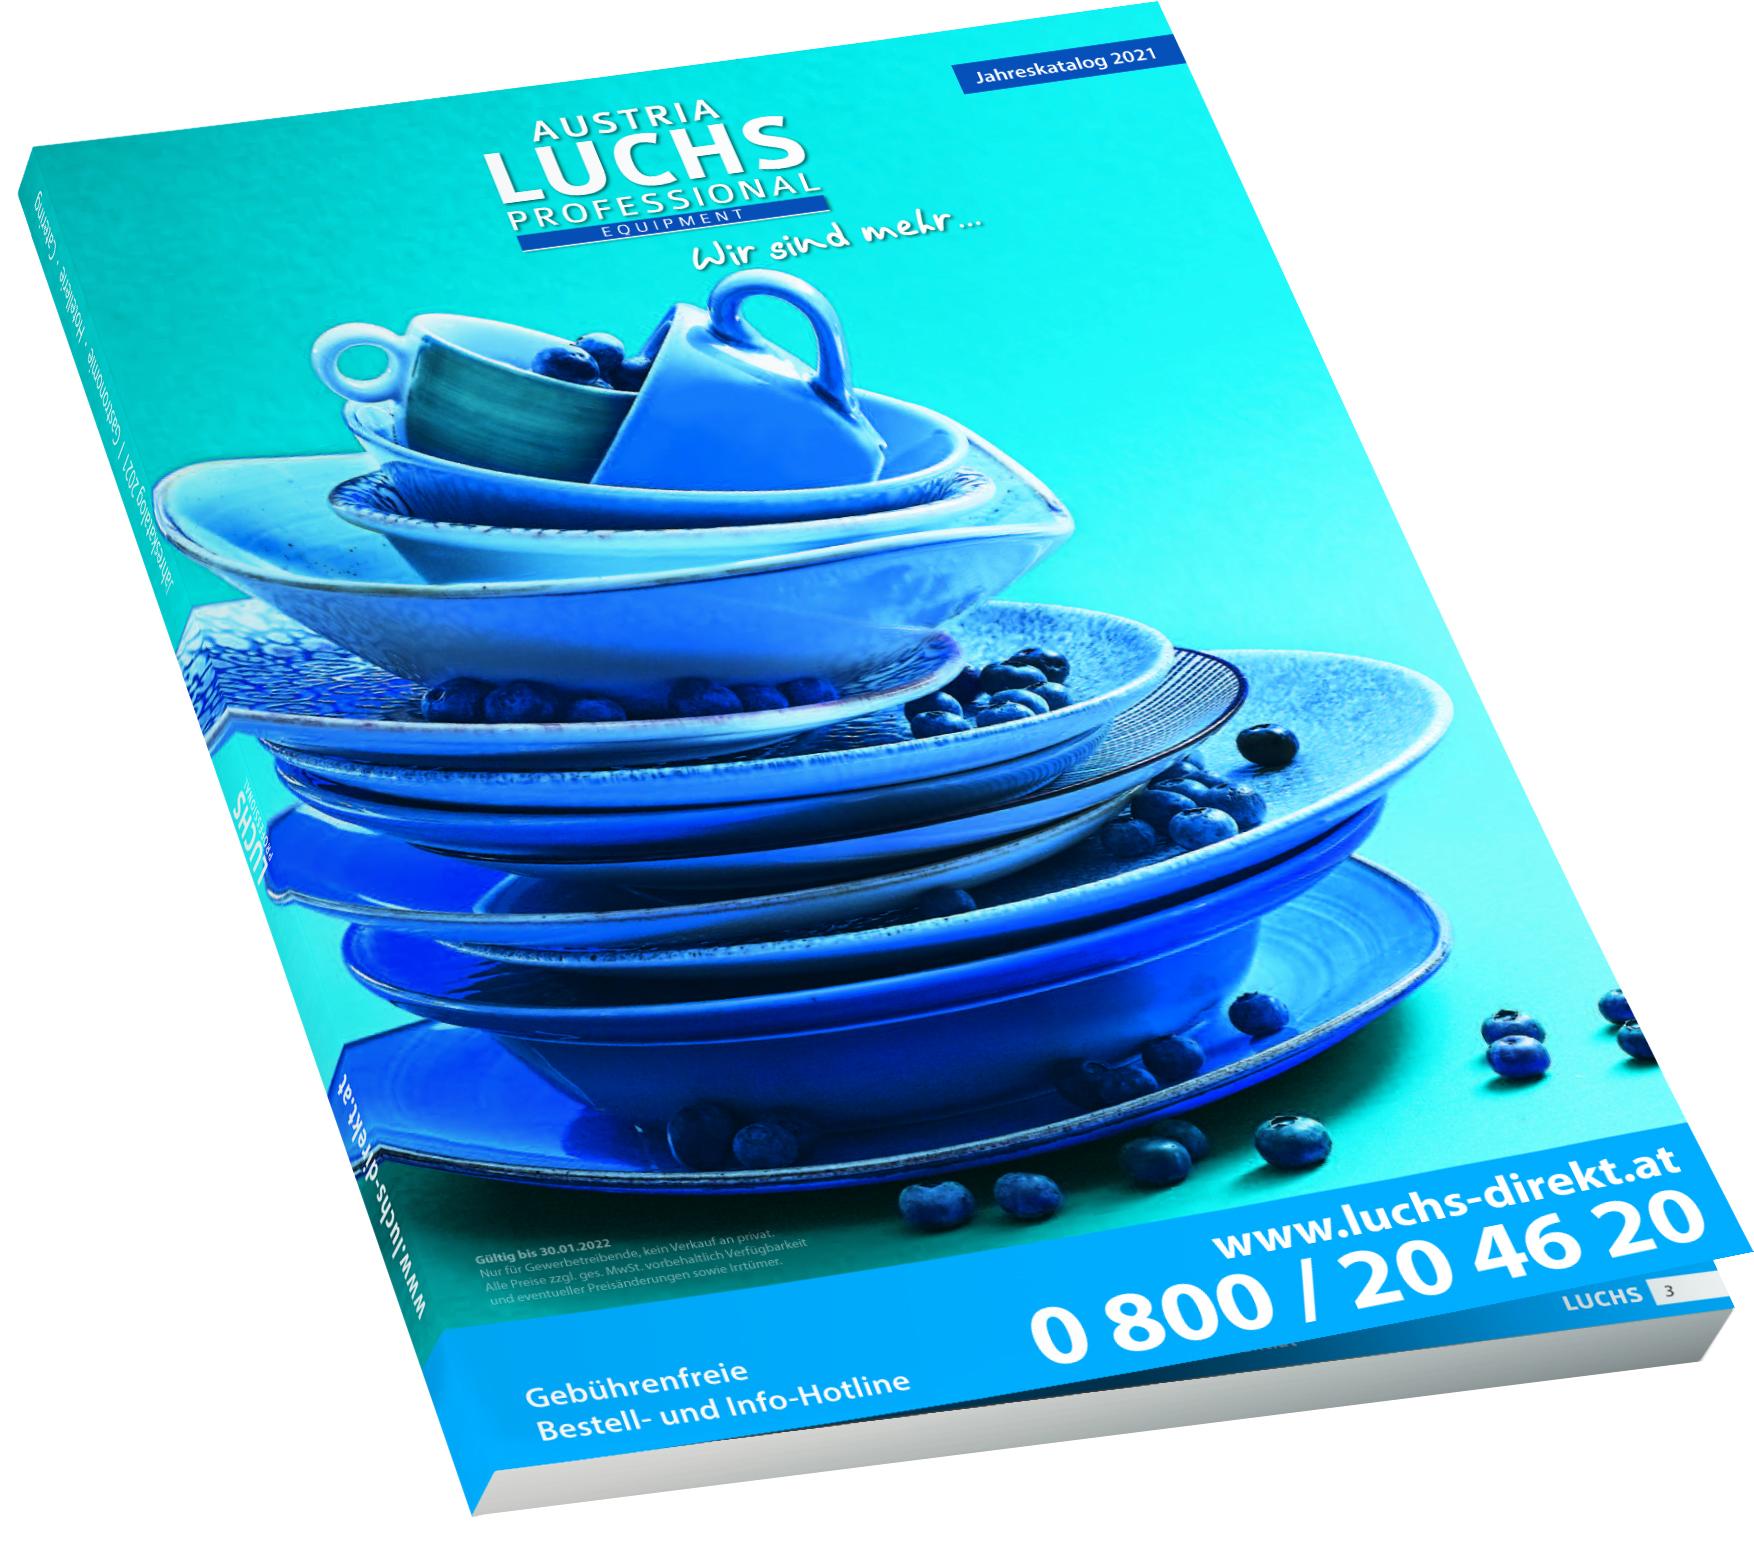 LUCHS_THK_3D_2021_AT